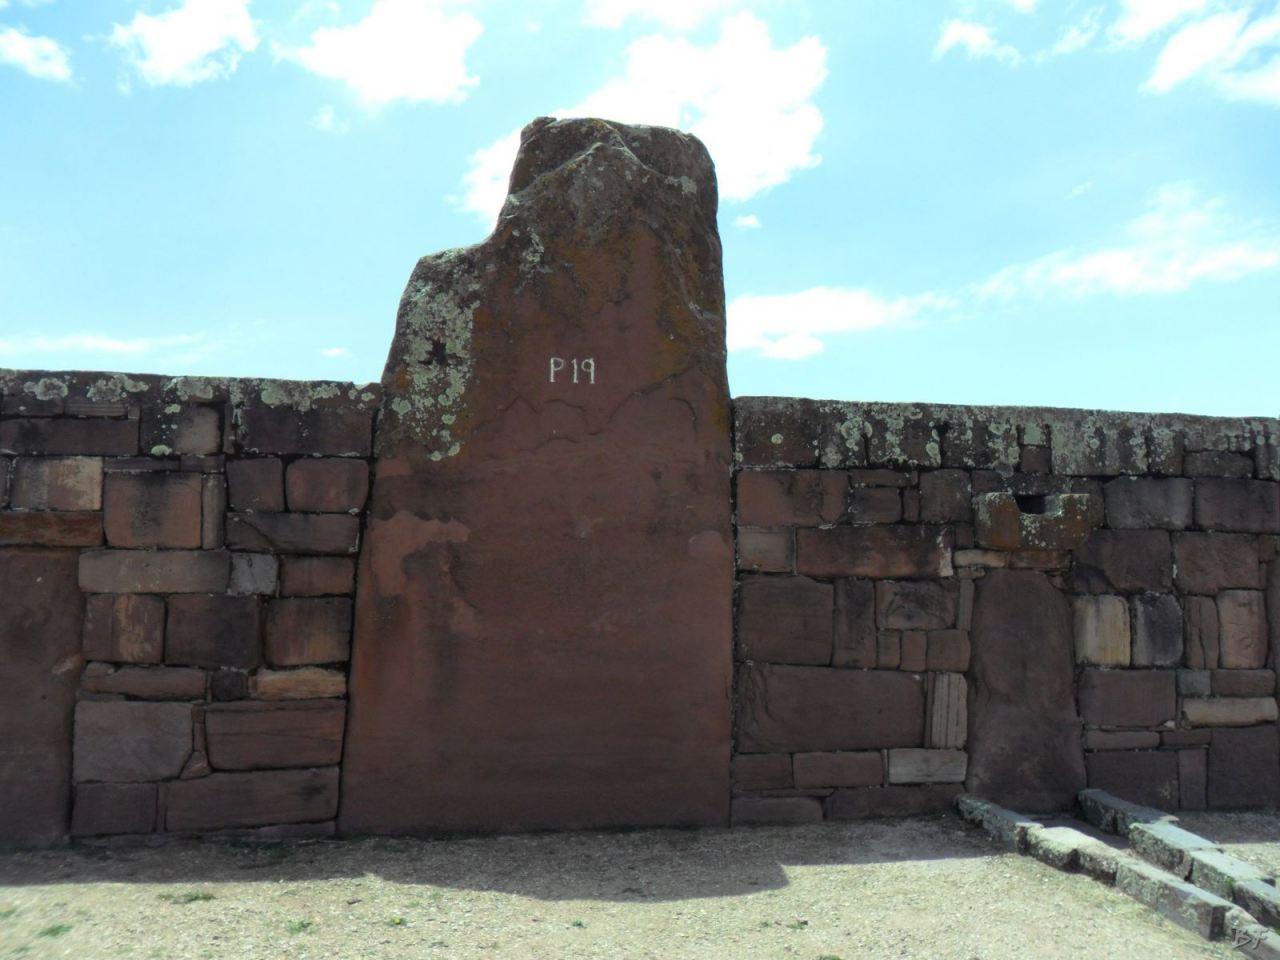 Sito-Megalitico-Piramide-Akapana-Kalasasaya-Menhir-Tiahuanaco-Bolivia-63